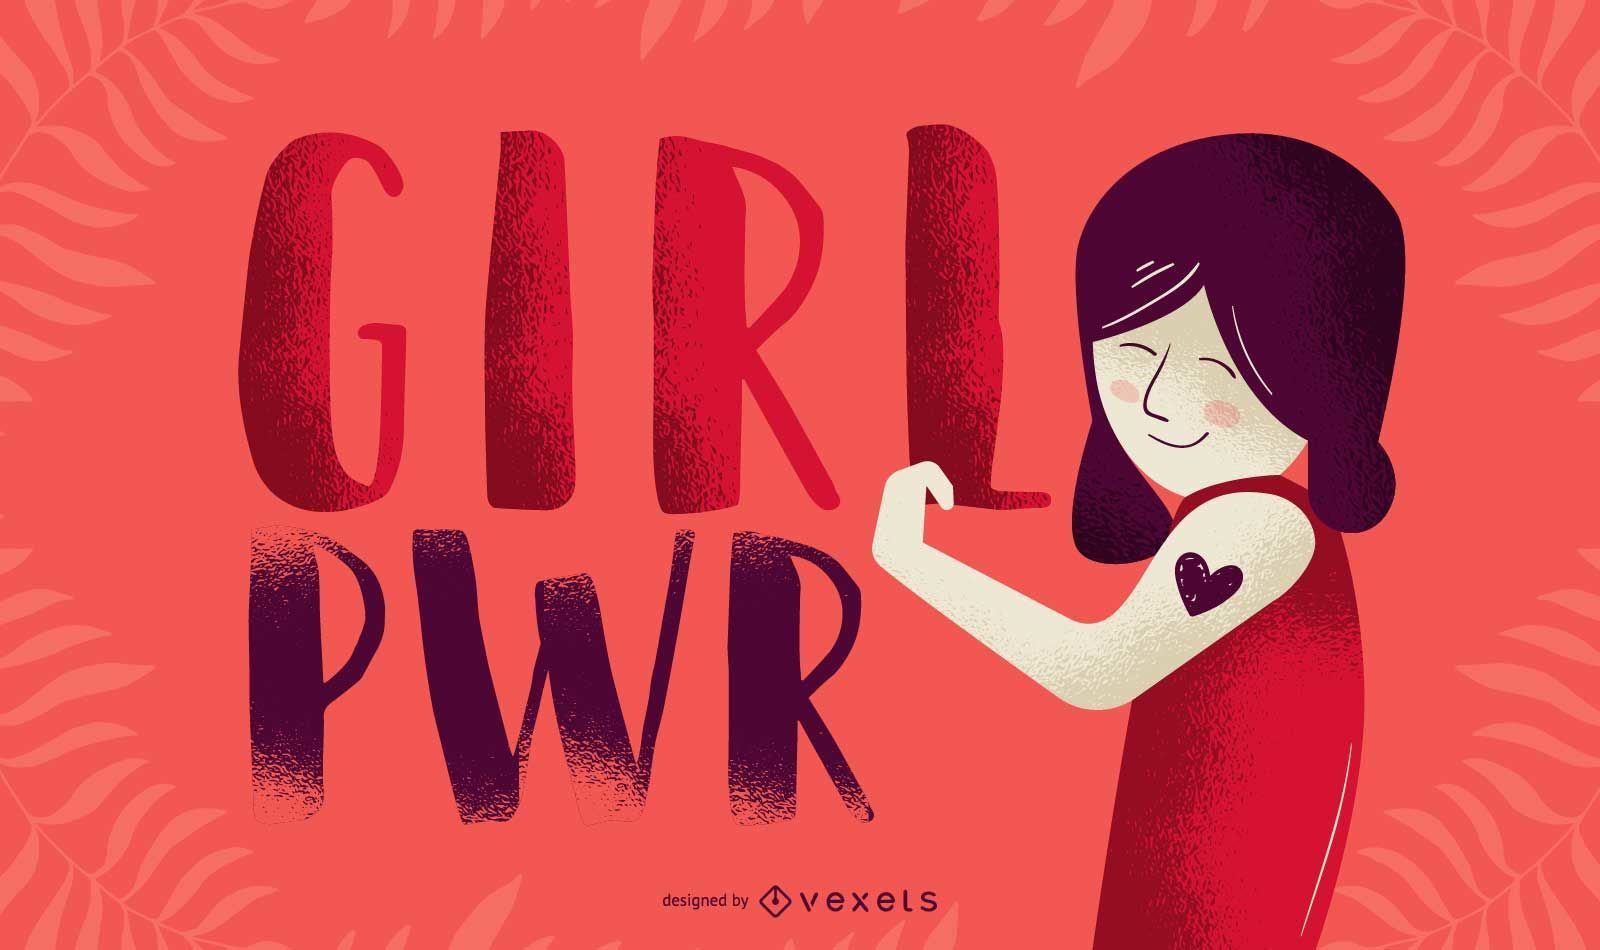 Girl pwr flexing illustration